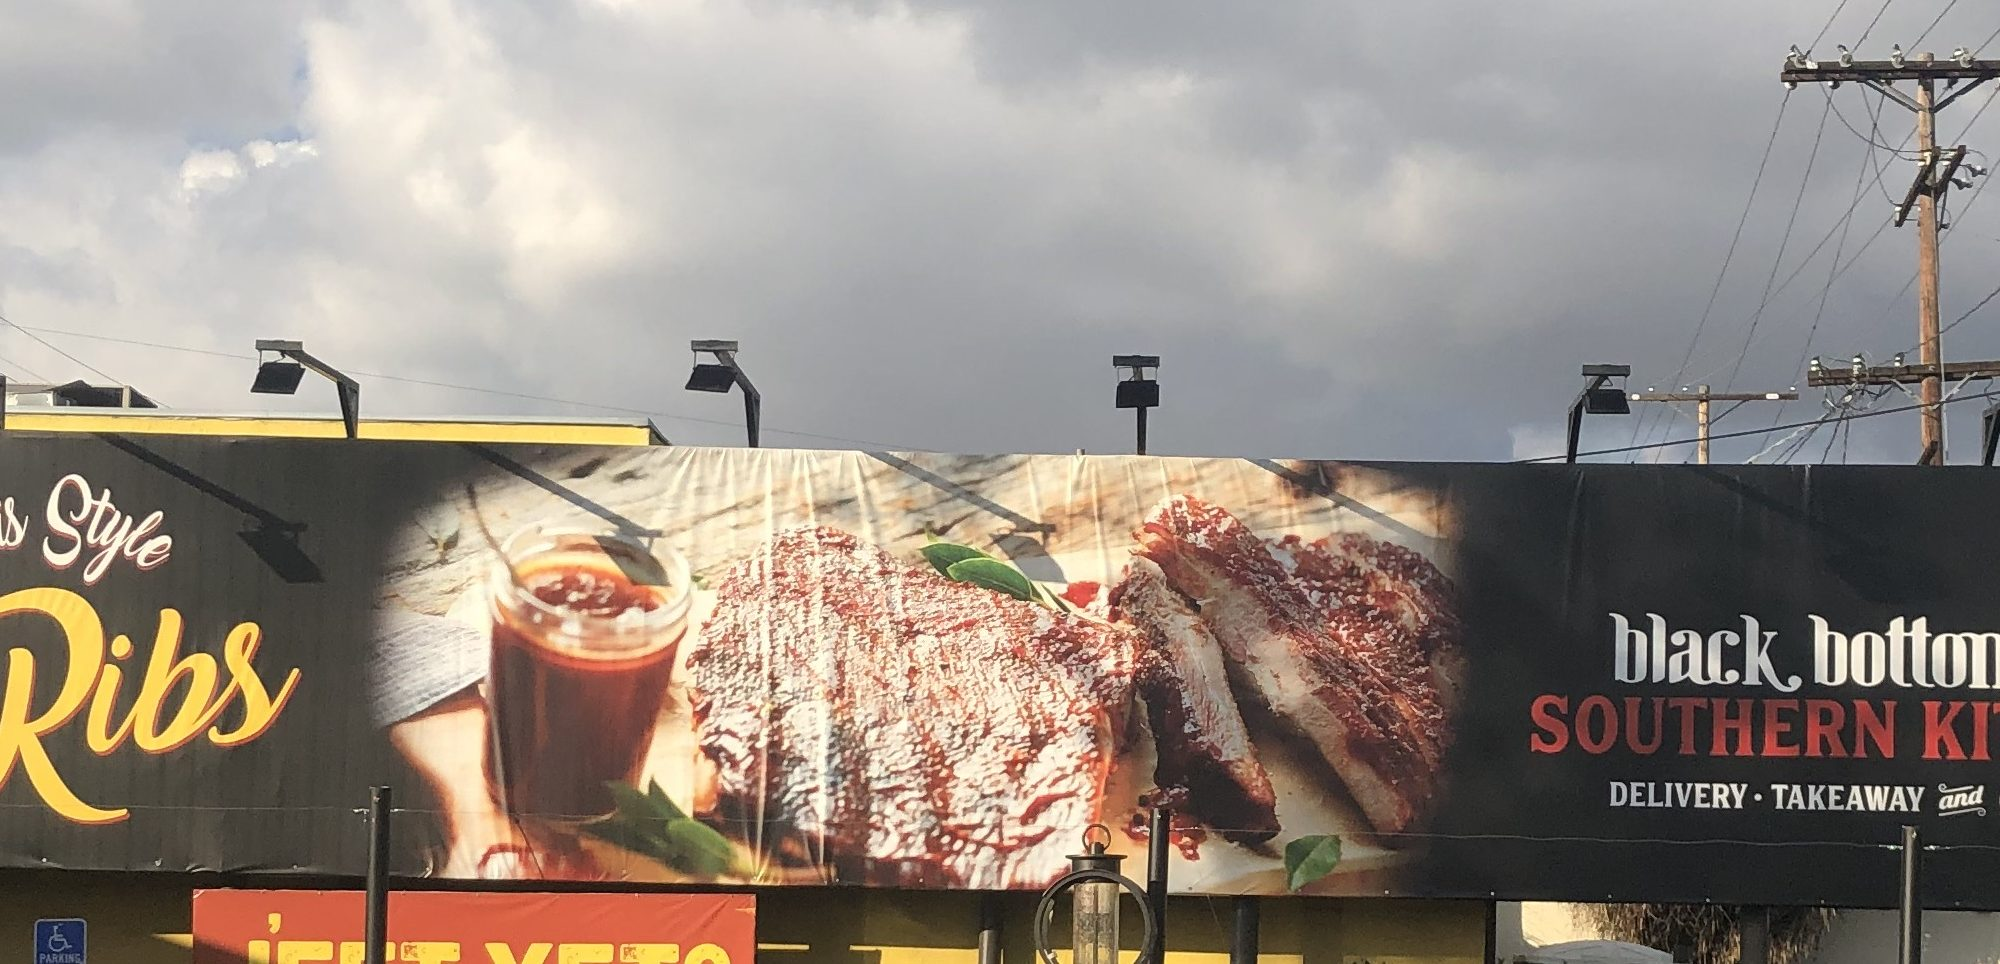 giant banner, Banner, Custom Banners San Fernando Valley, Business Sign Company North Hollywood, Business Banner, Black Bottom Kitchen Restaurant North Hollywood, Large Digital Banner North Hollywood, Restaurant Banner North Hollywood, Premium Sign Solutions Tarzana, San Fernando Valley Sign Company